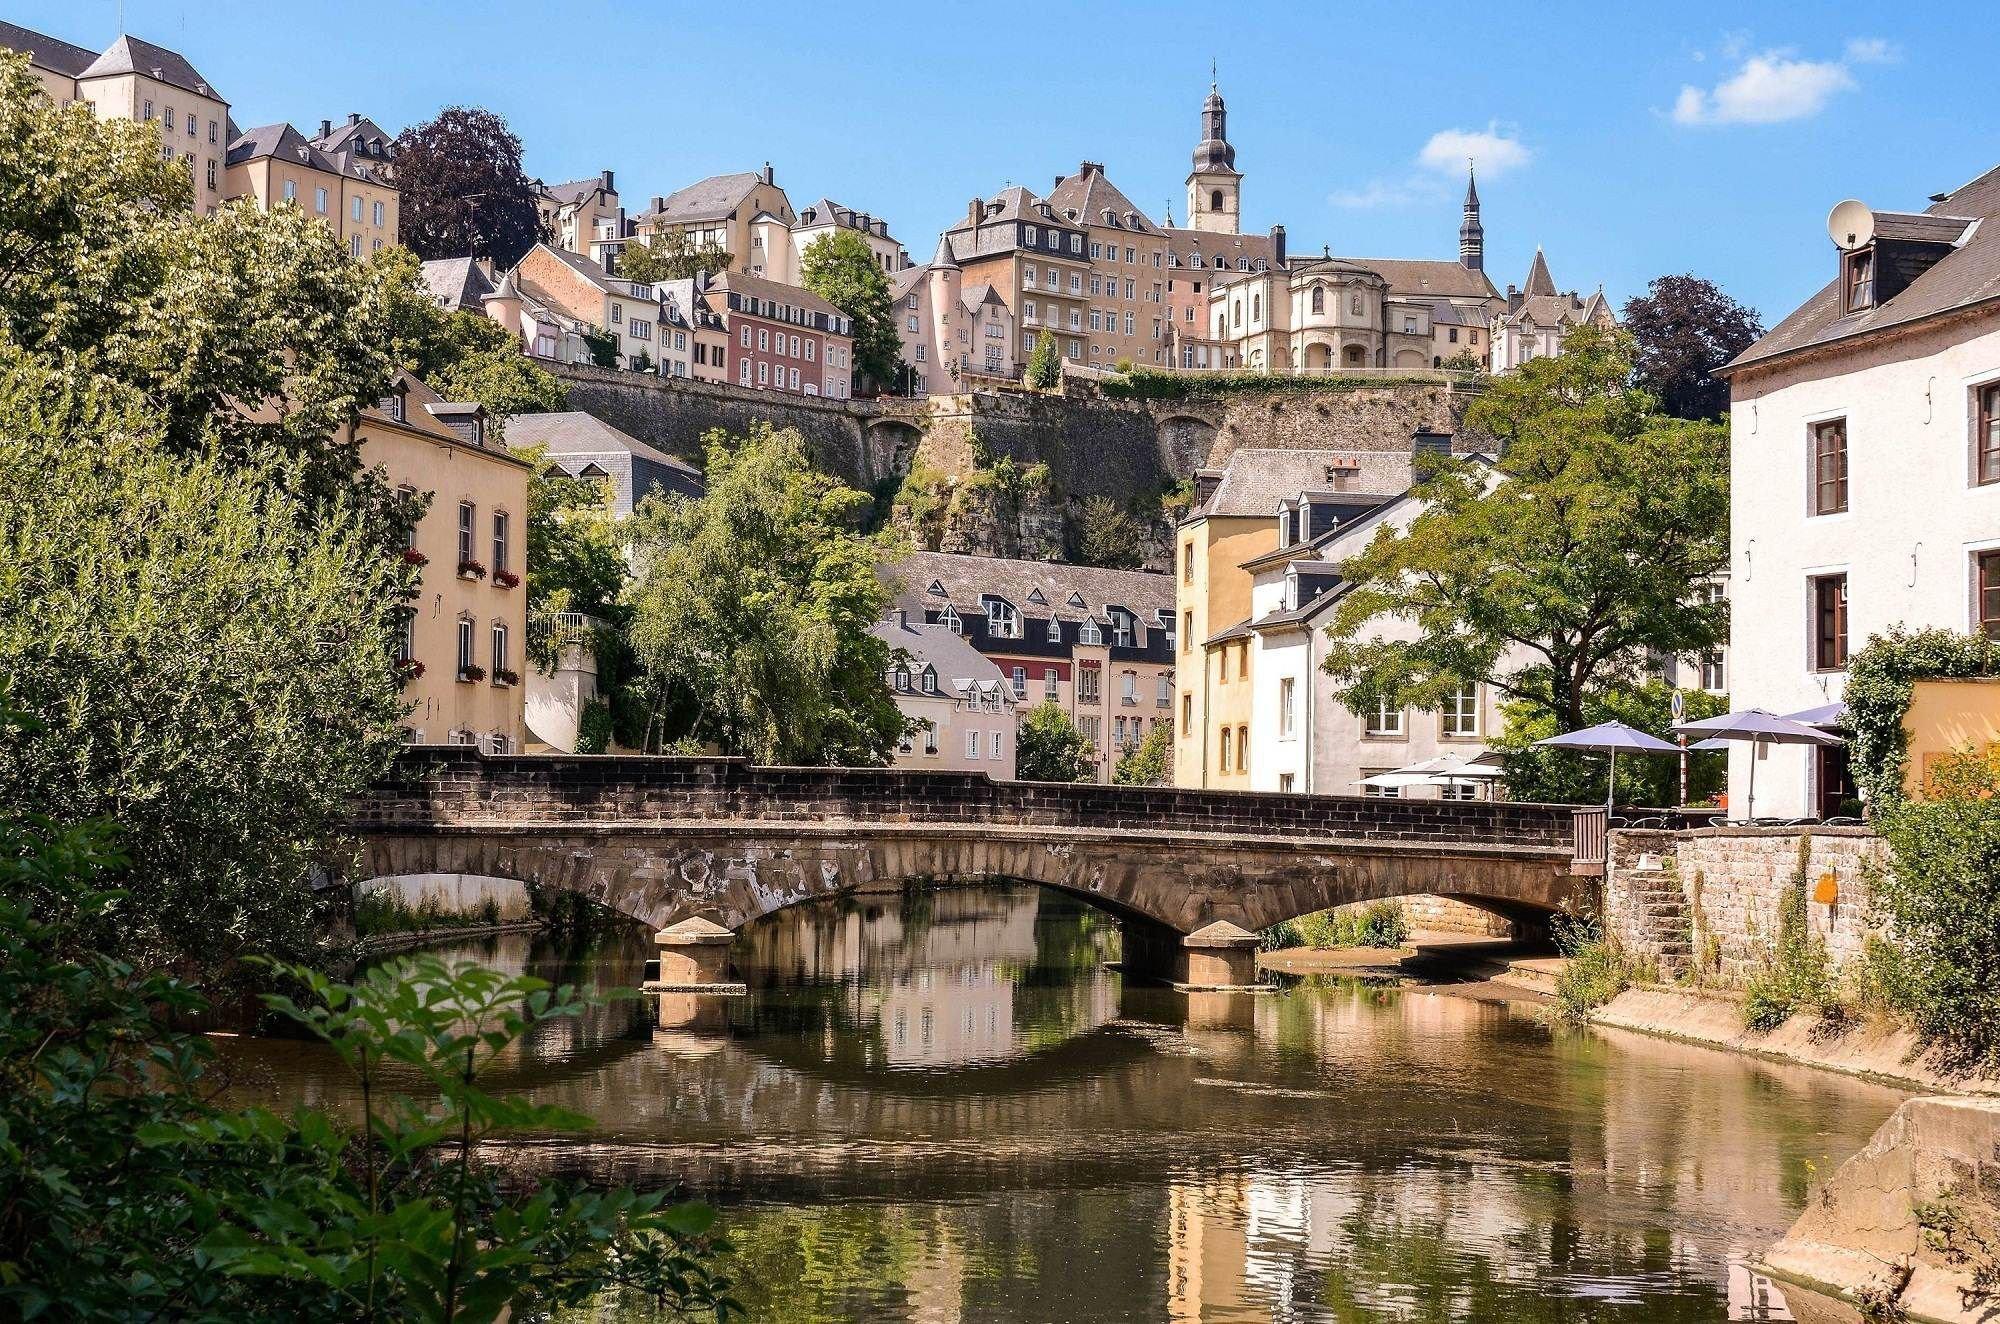 Dagaanbieding - 2 of 3 dagen historisch Luxemburg Stad incl. ontbijt dagelijkse koopjes